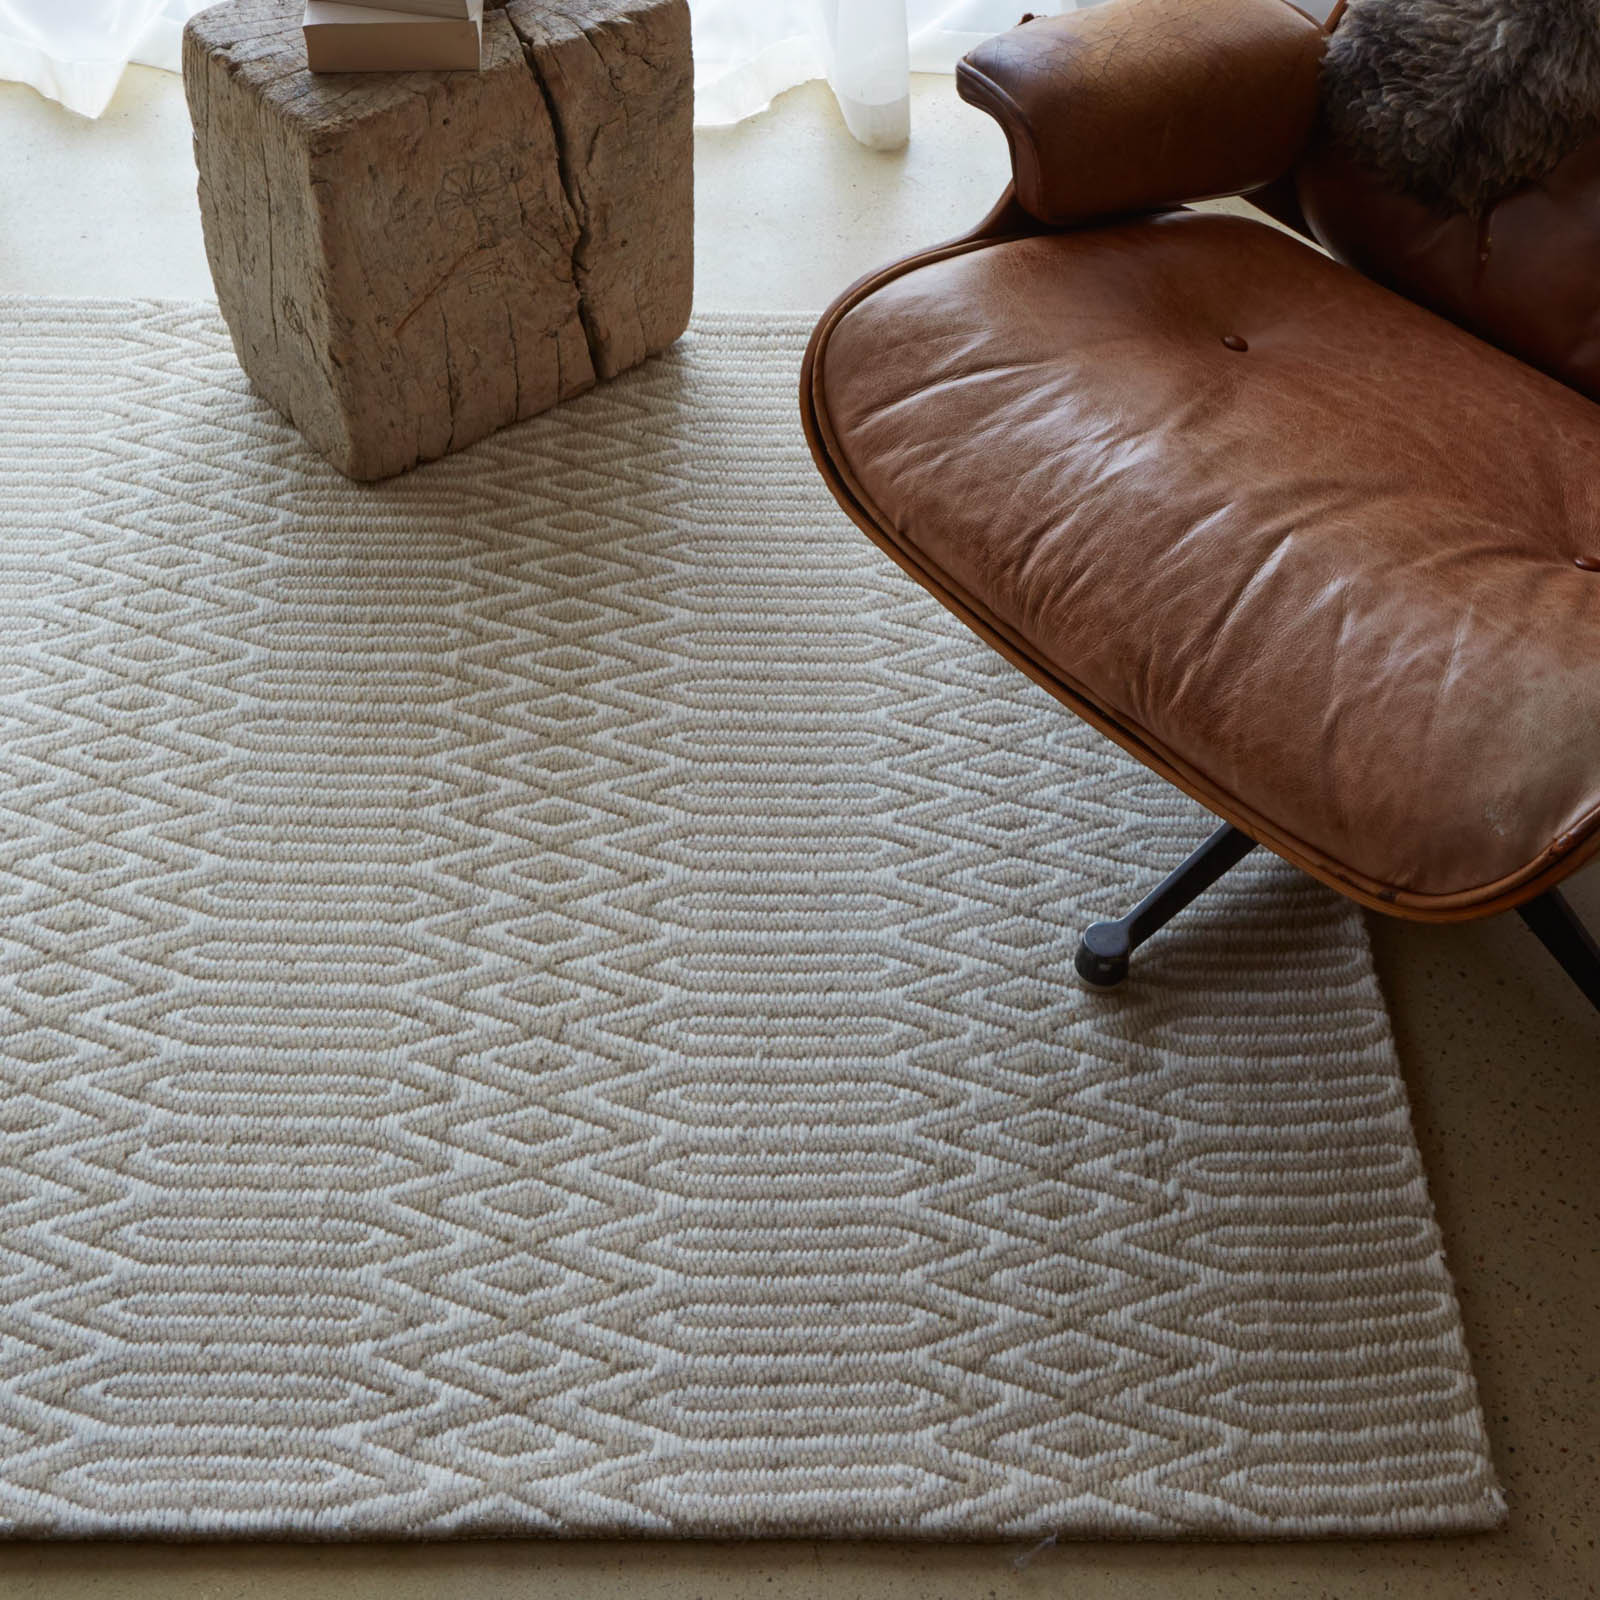 Plantation Serengeti living room rugs